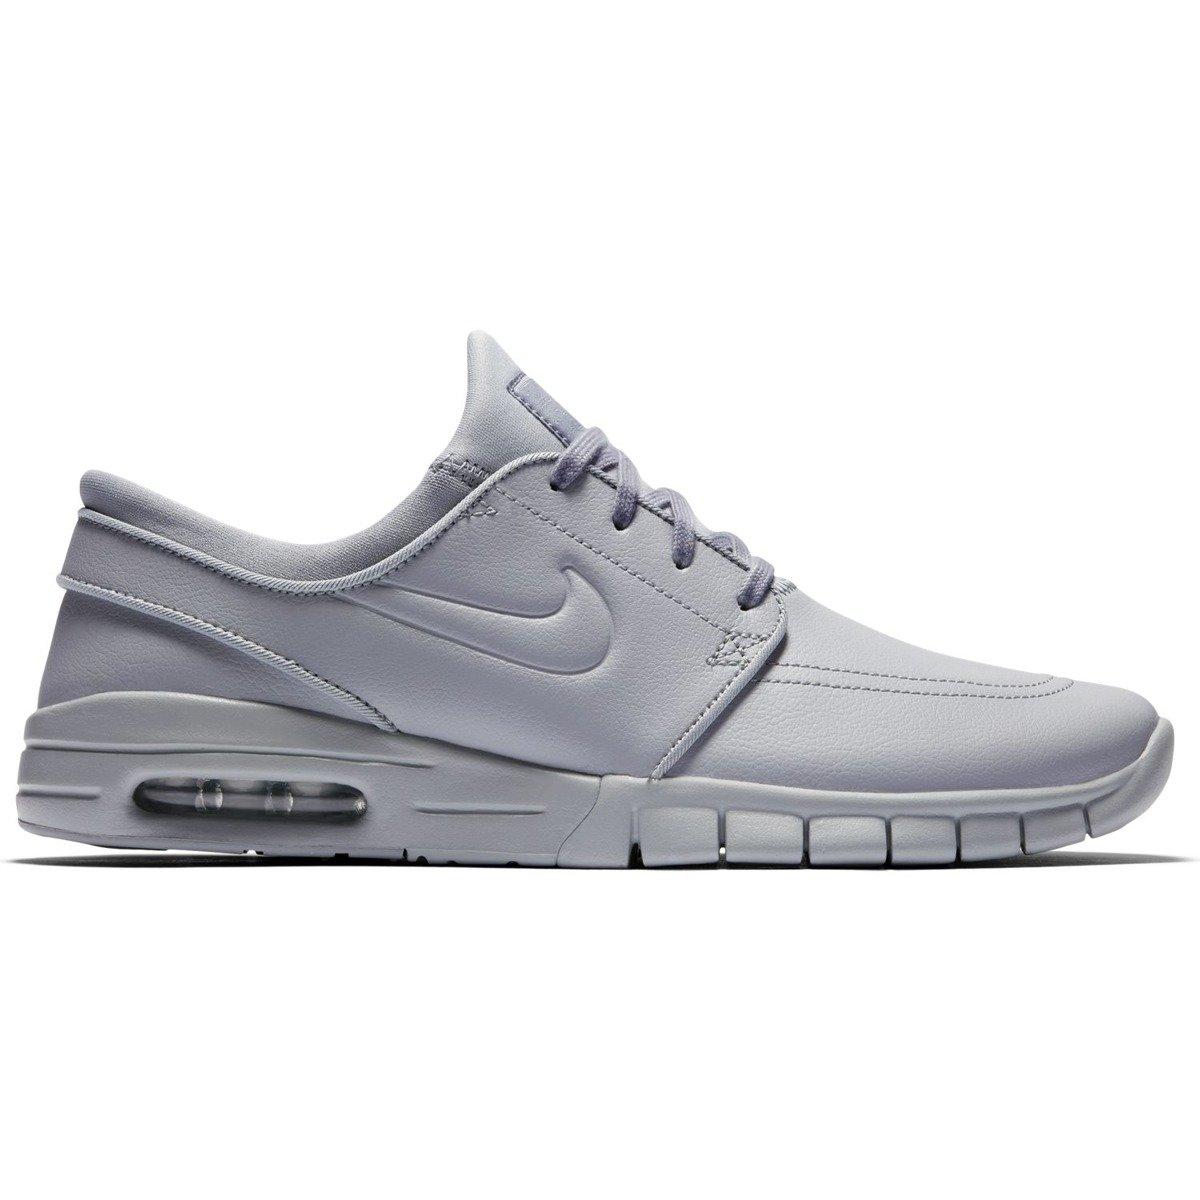 Miniramp Skateshop buty nike stefan max janoski max stefan l skateboarding scarpe   263737